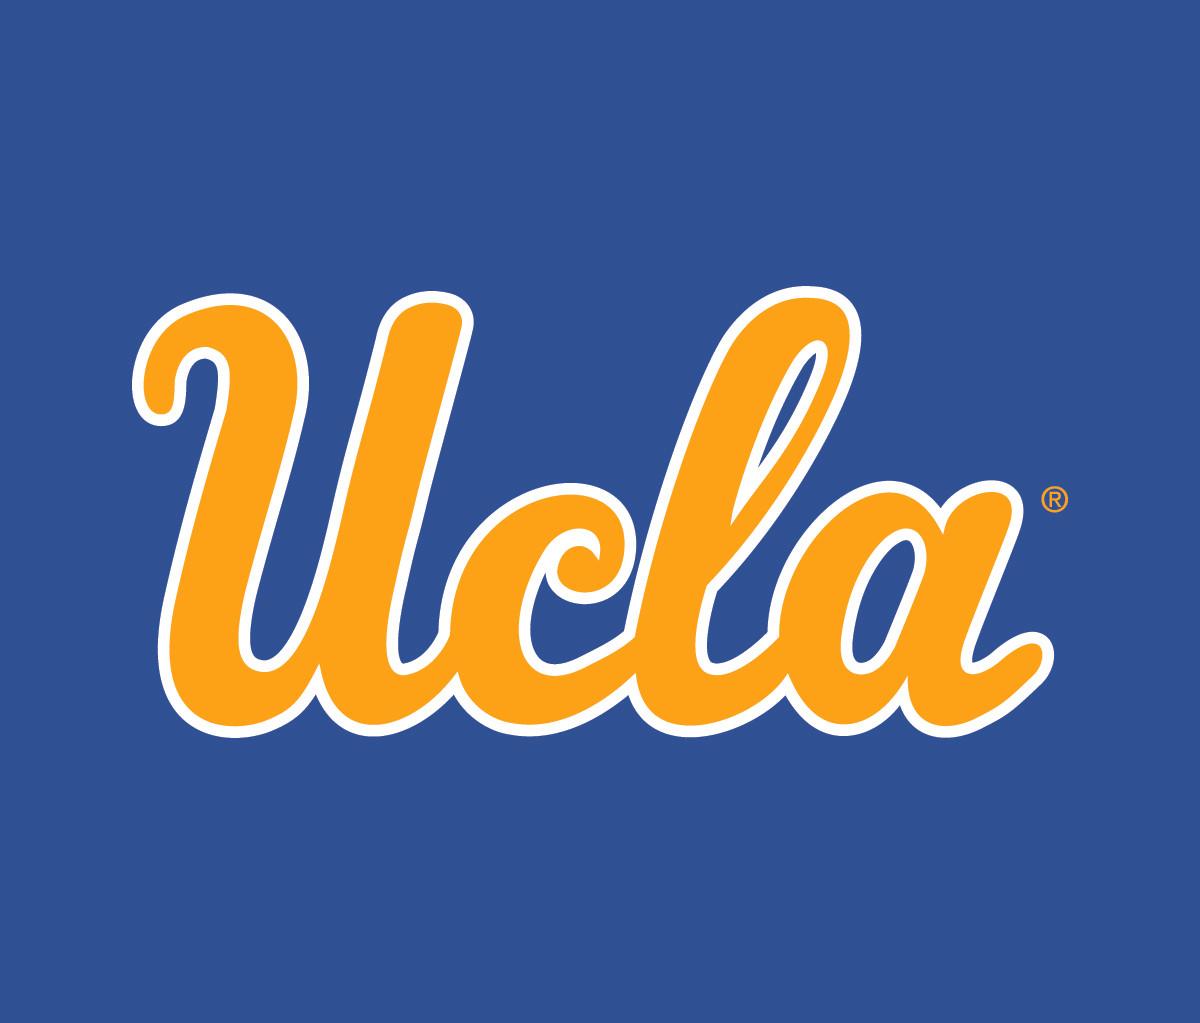 UCLA.jpeg